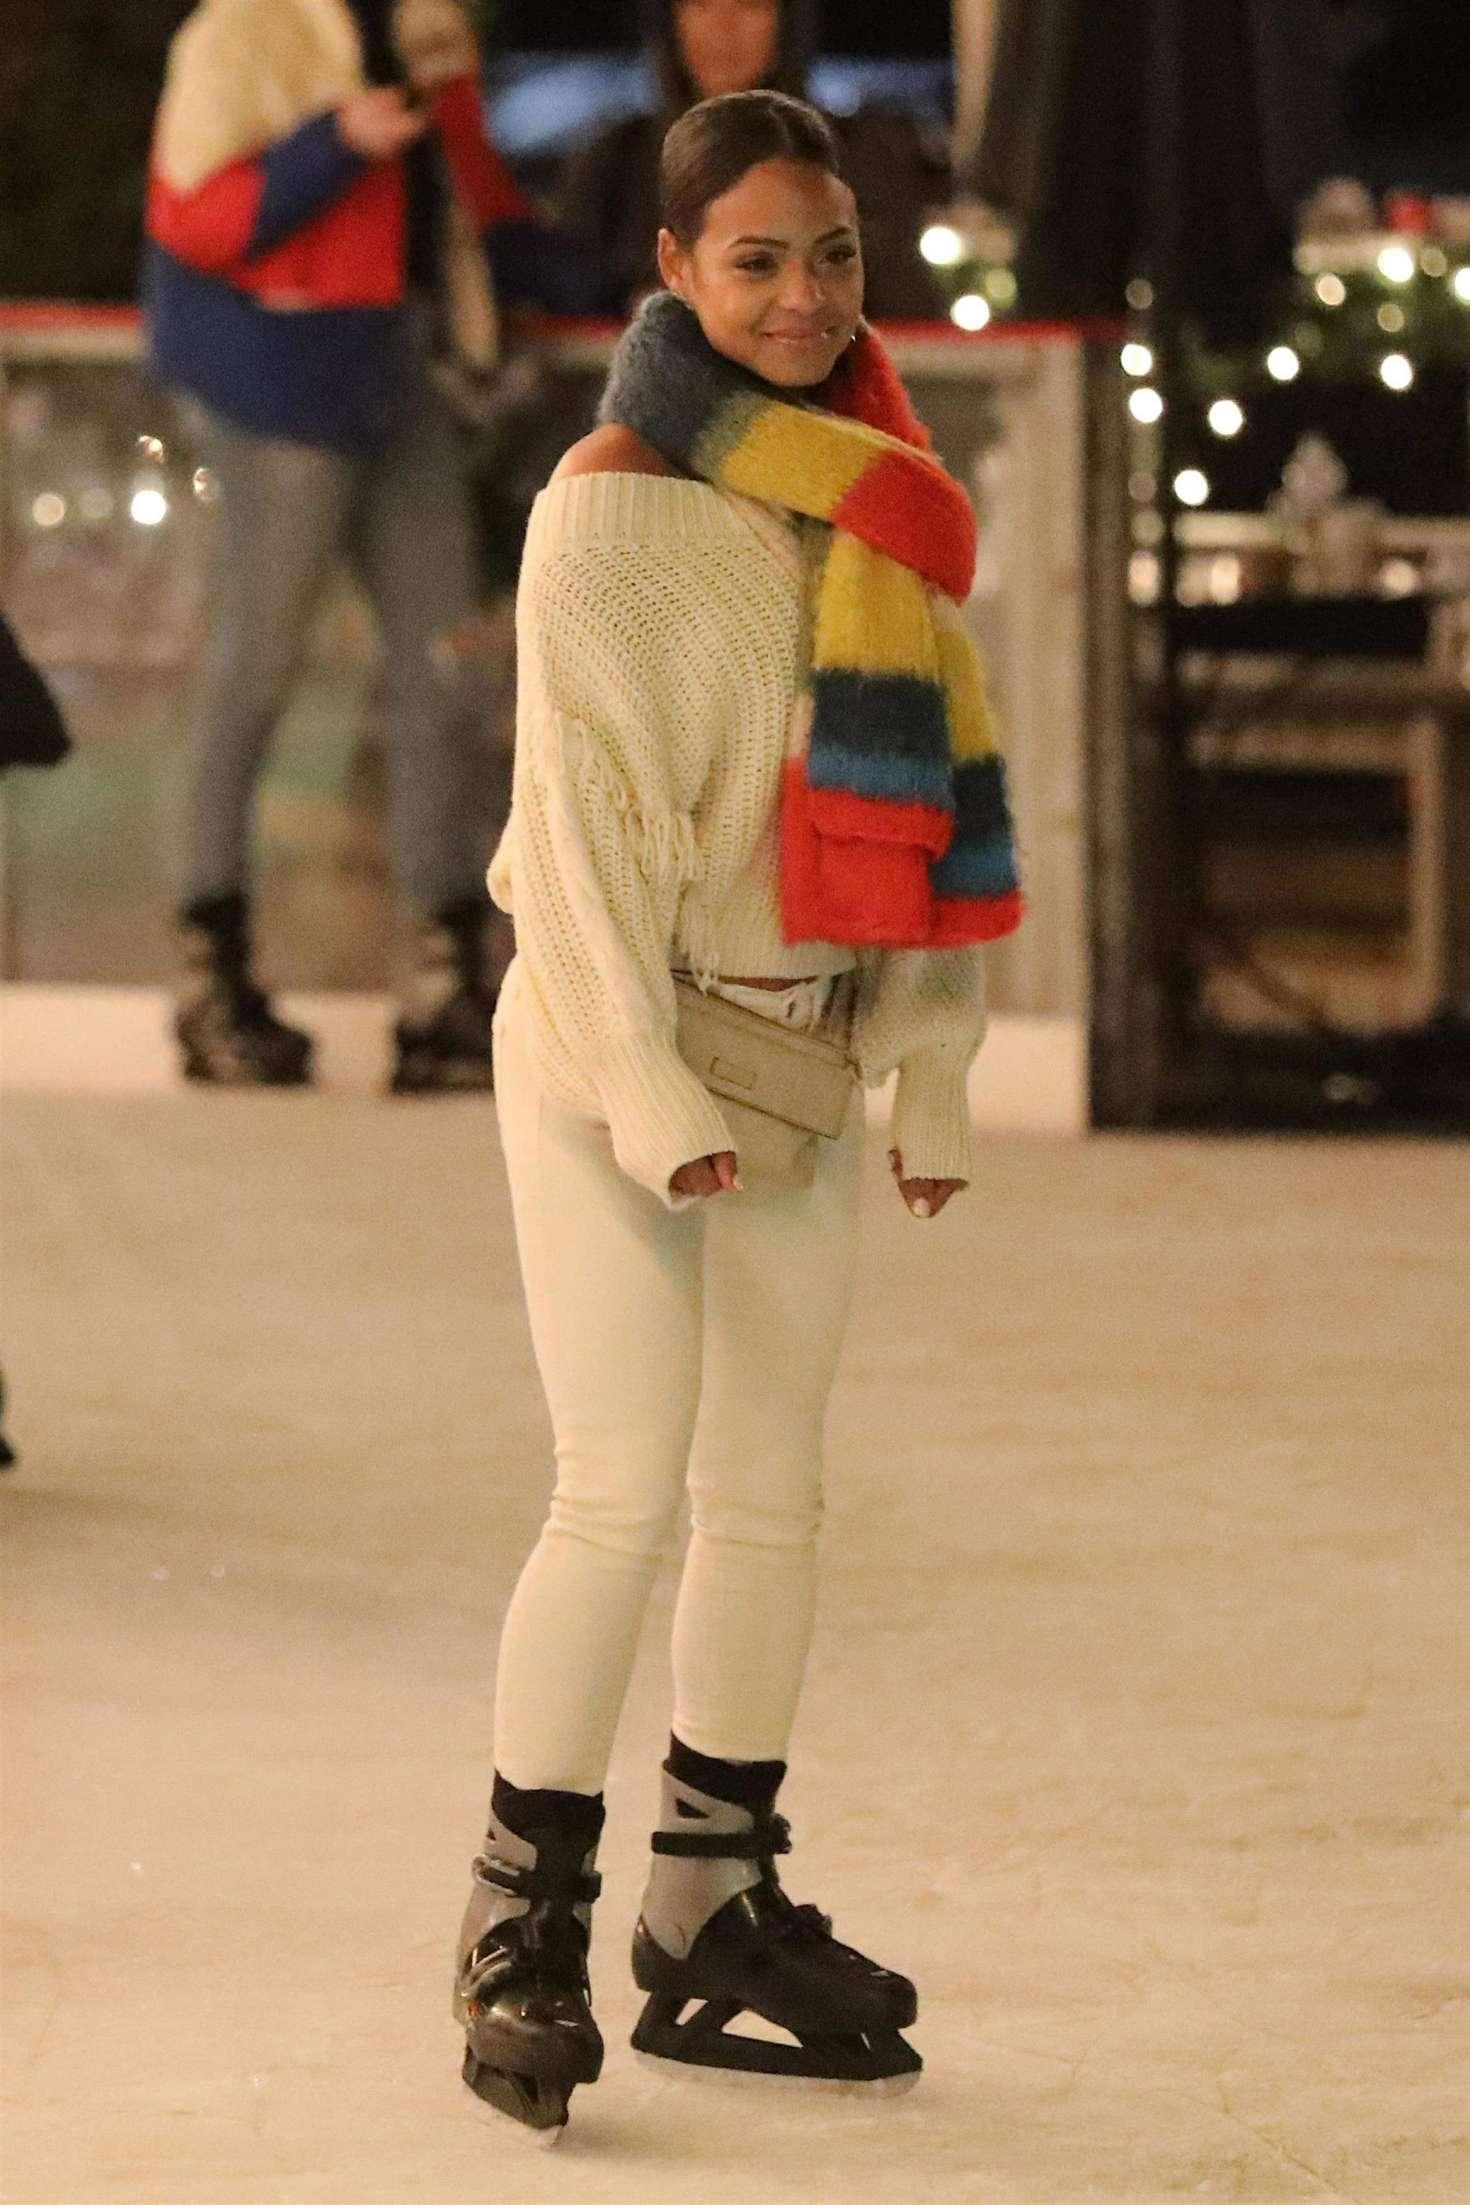 Christina Millian – Ice skating at Larsa Pippens Party in Los Angeles